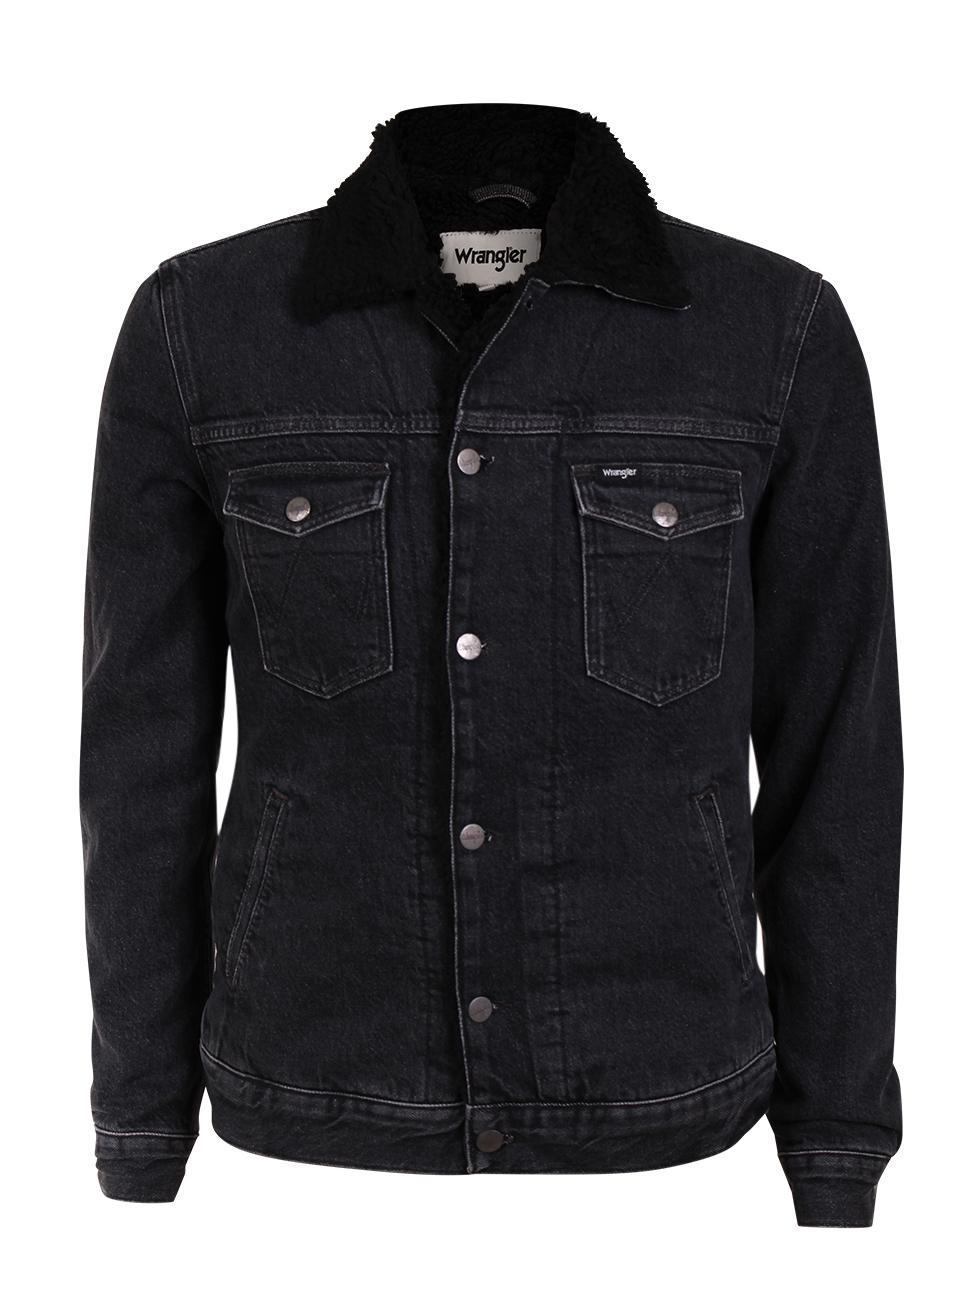 wrangler herren jeansjacke sherpa jacket schwarz midnight stone kaufen jeans direct de. Black Bedroom Furniture Sets. Home Design Ideas